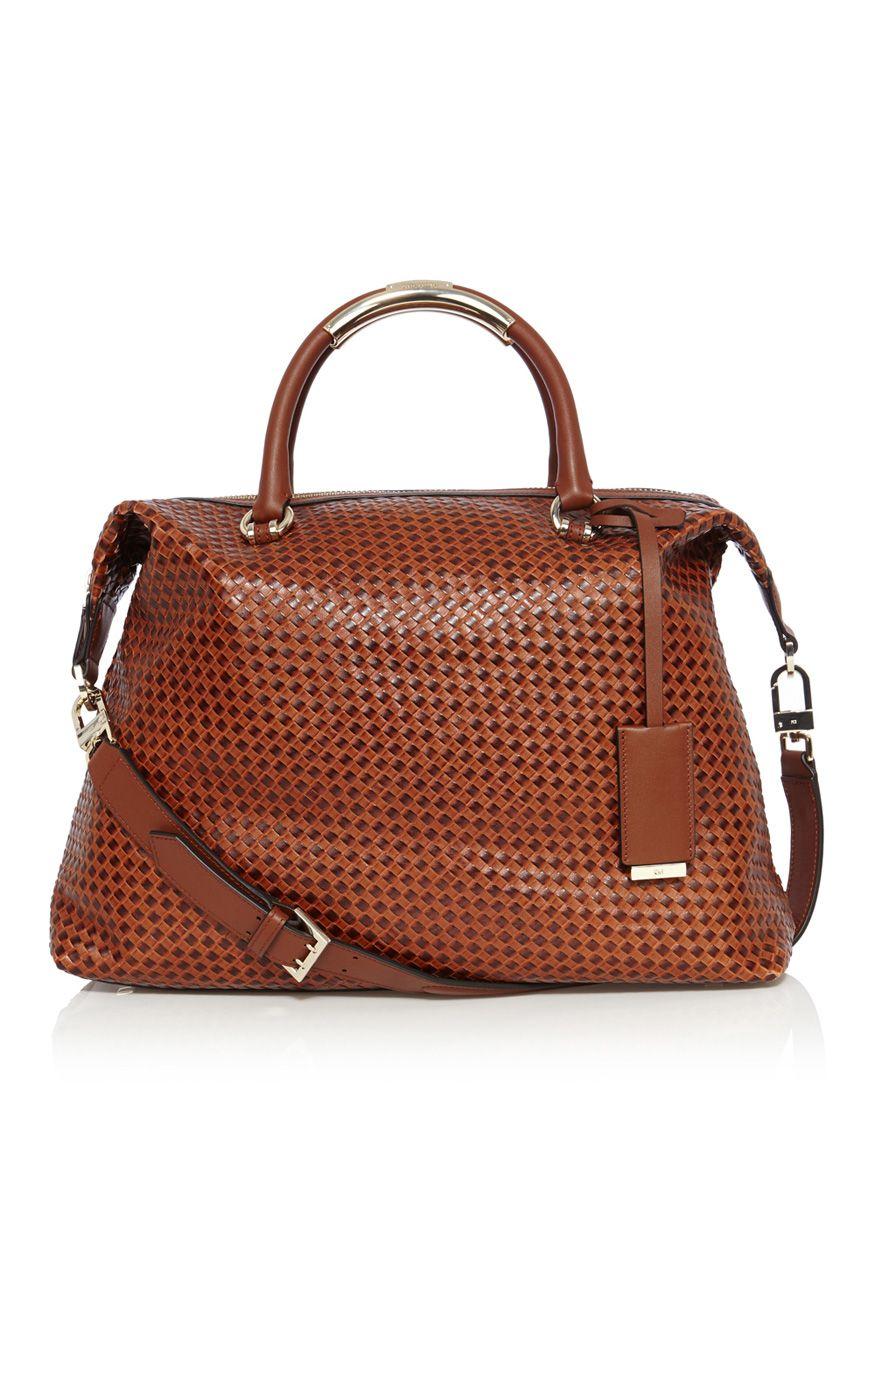 Woven Redchurch Tote Bag Luxury Women